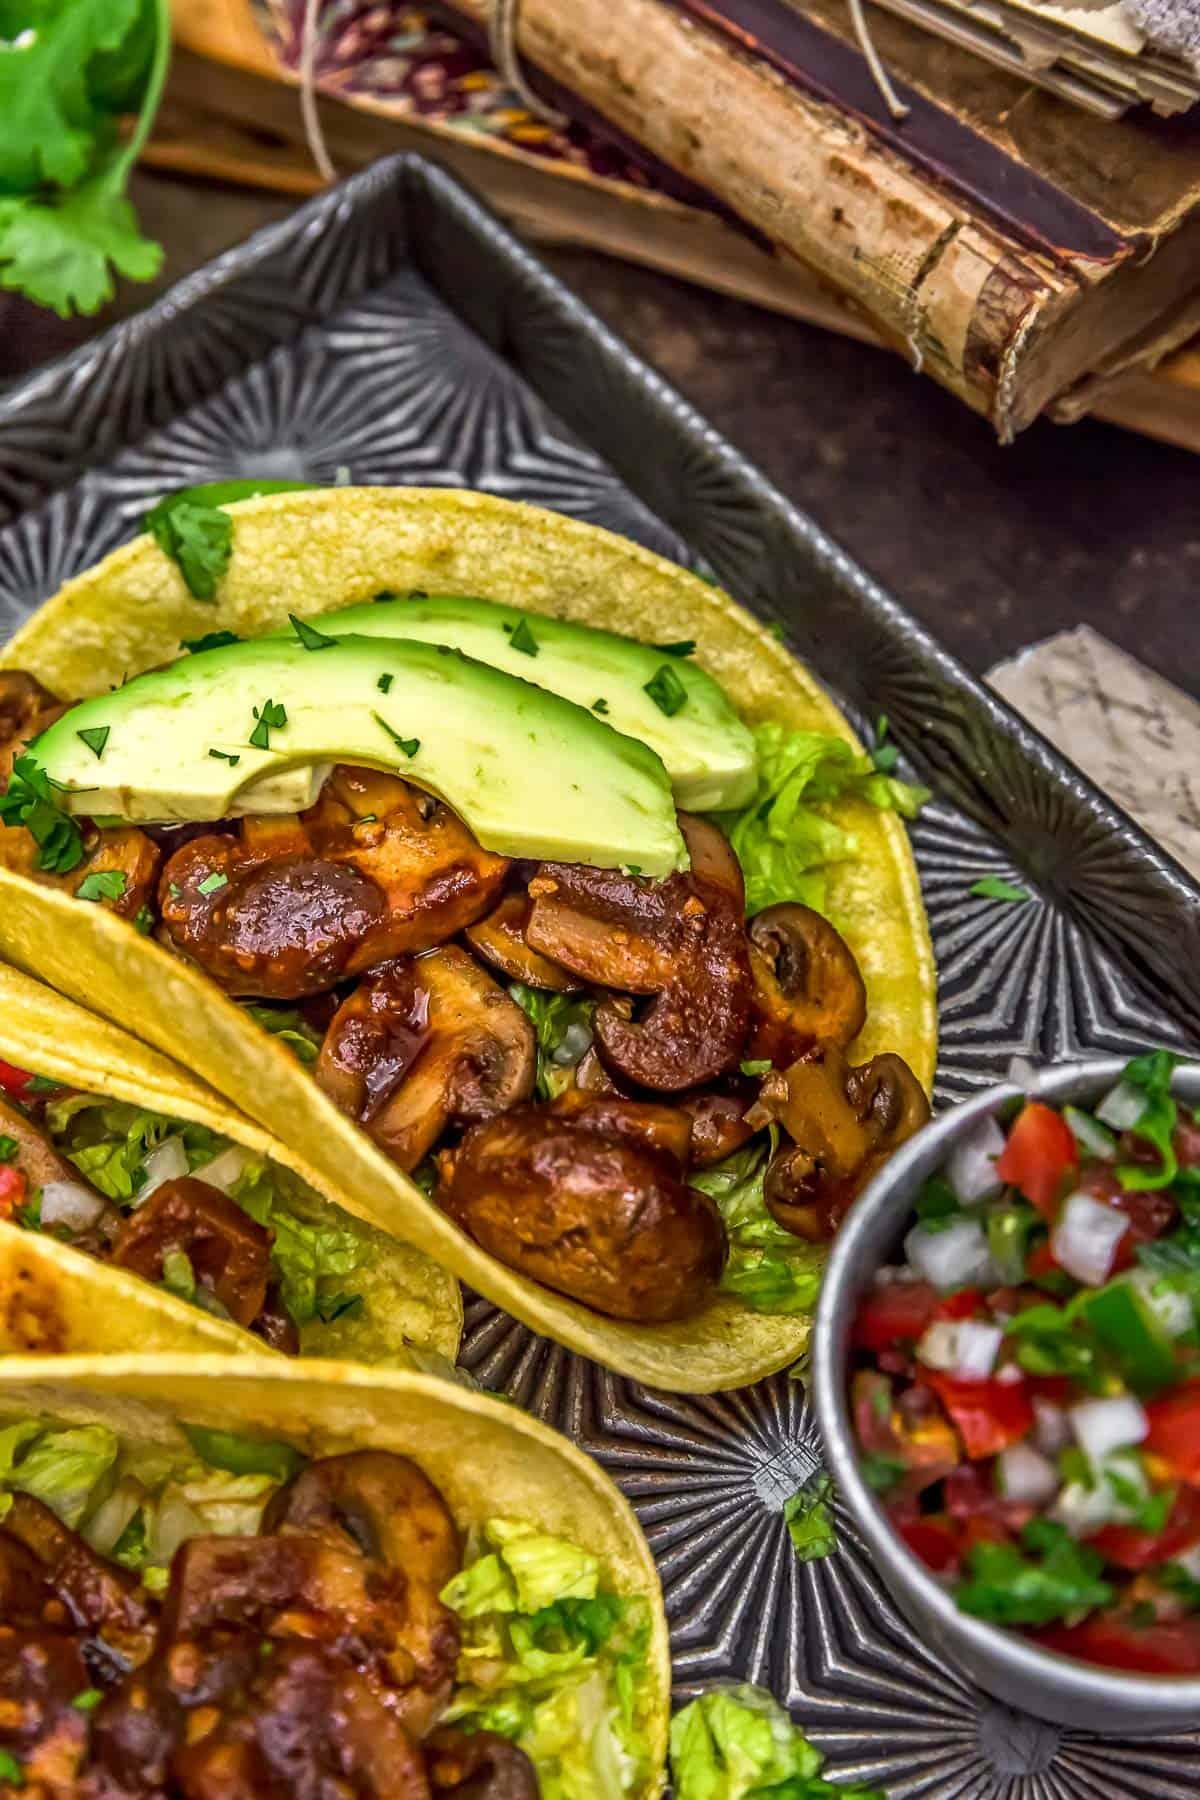 Chipotle Mushroom Tacos with avocado